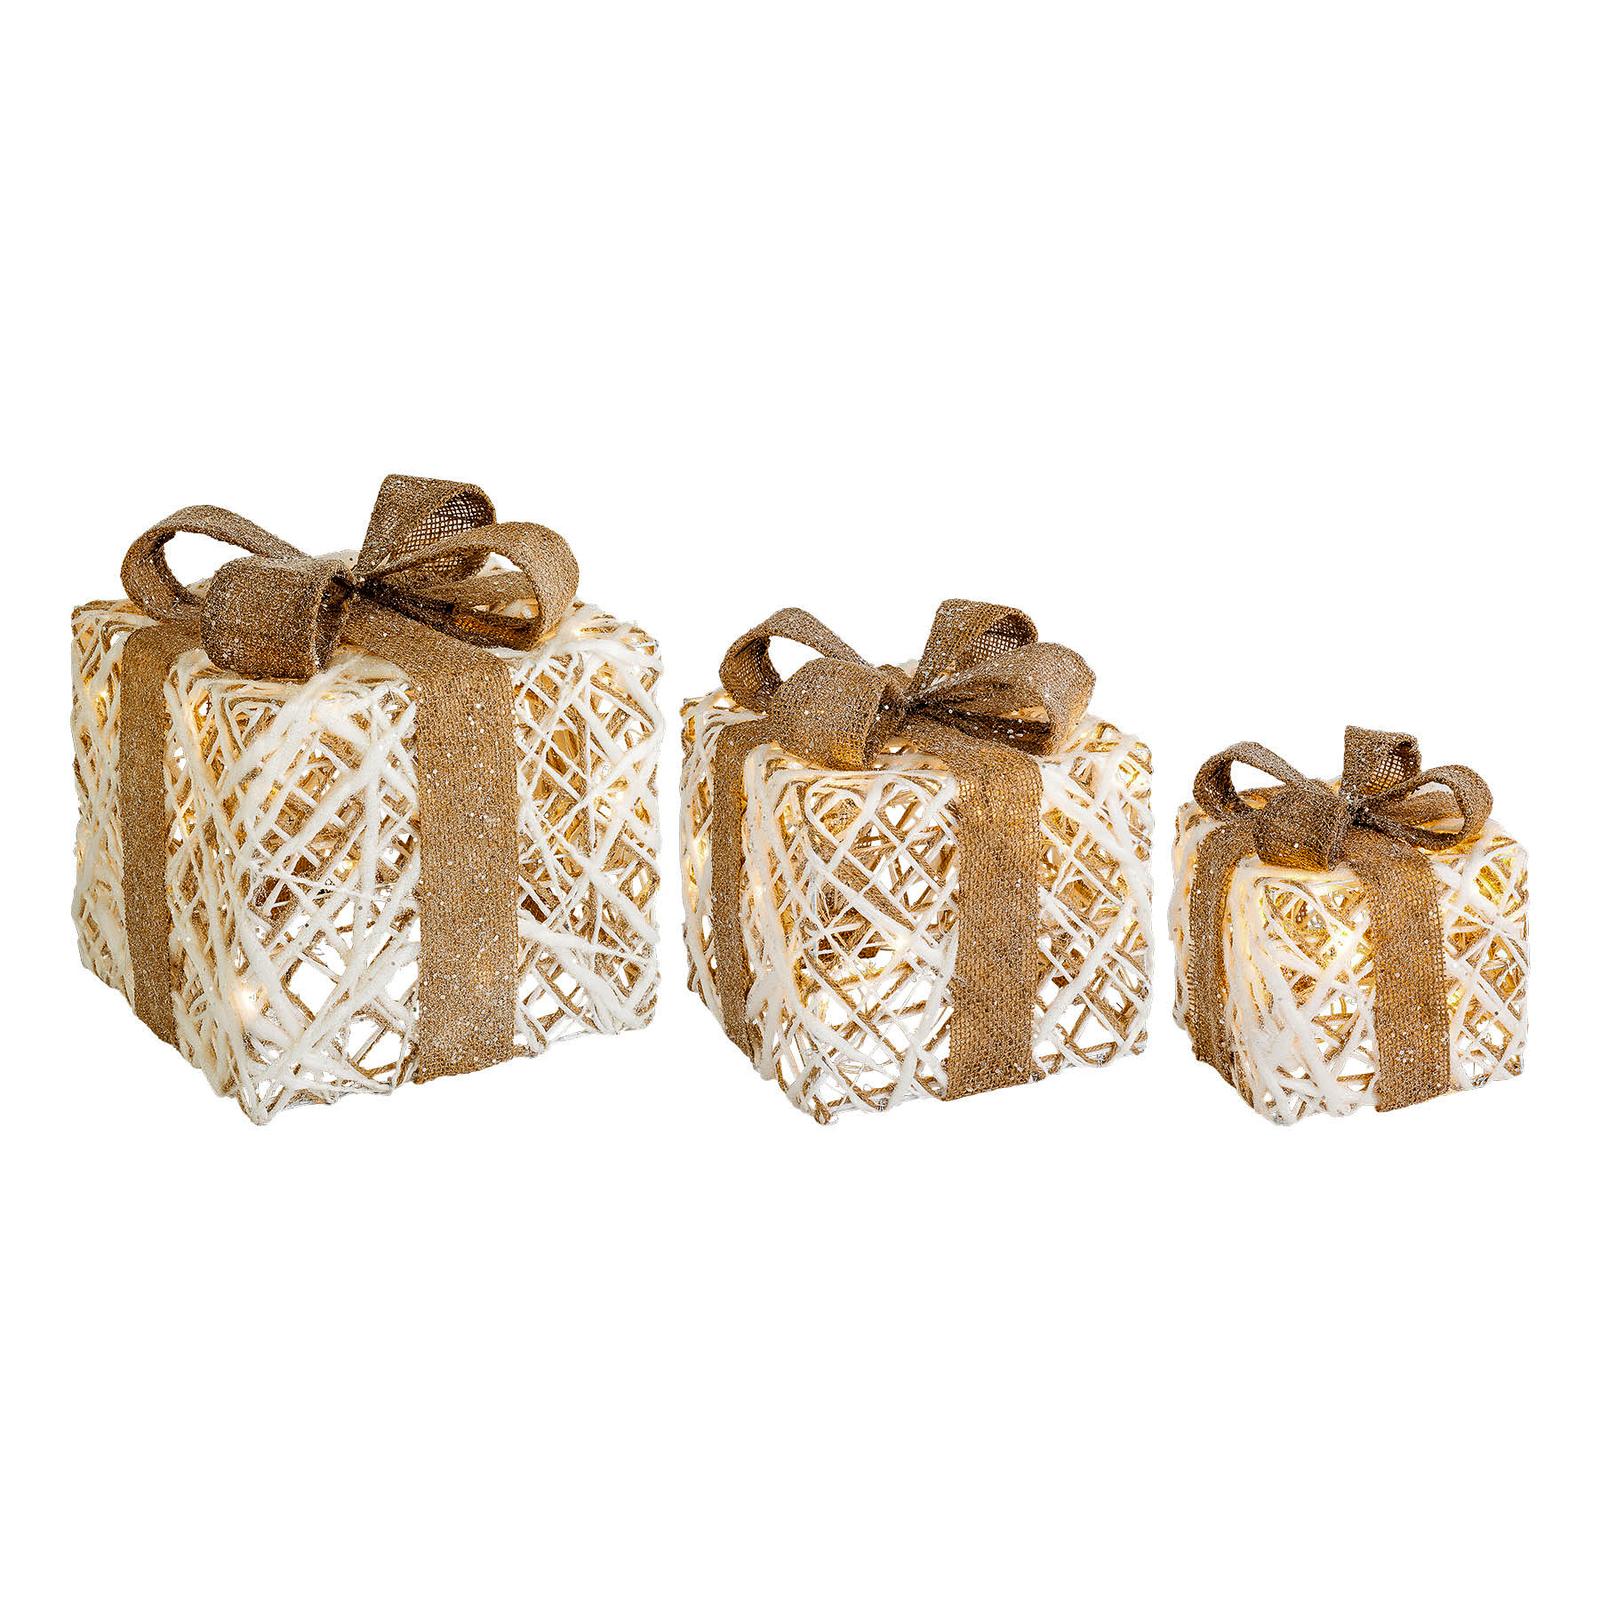 Lumineo Objects LED-gaveæske, 3 stk, natur/brun